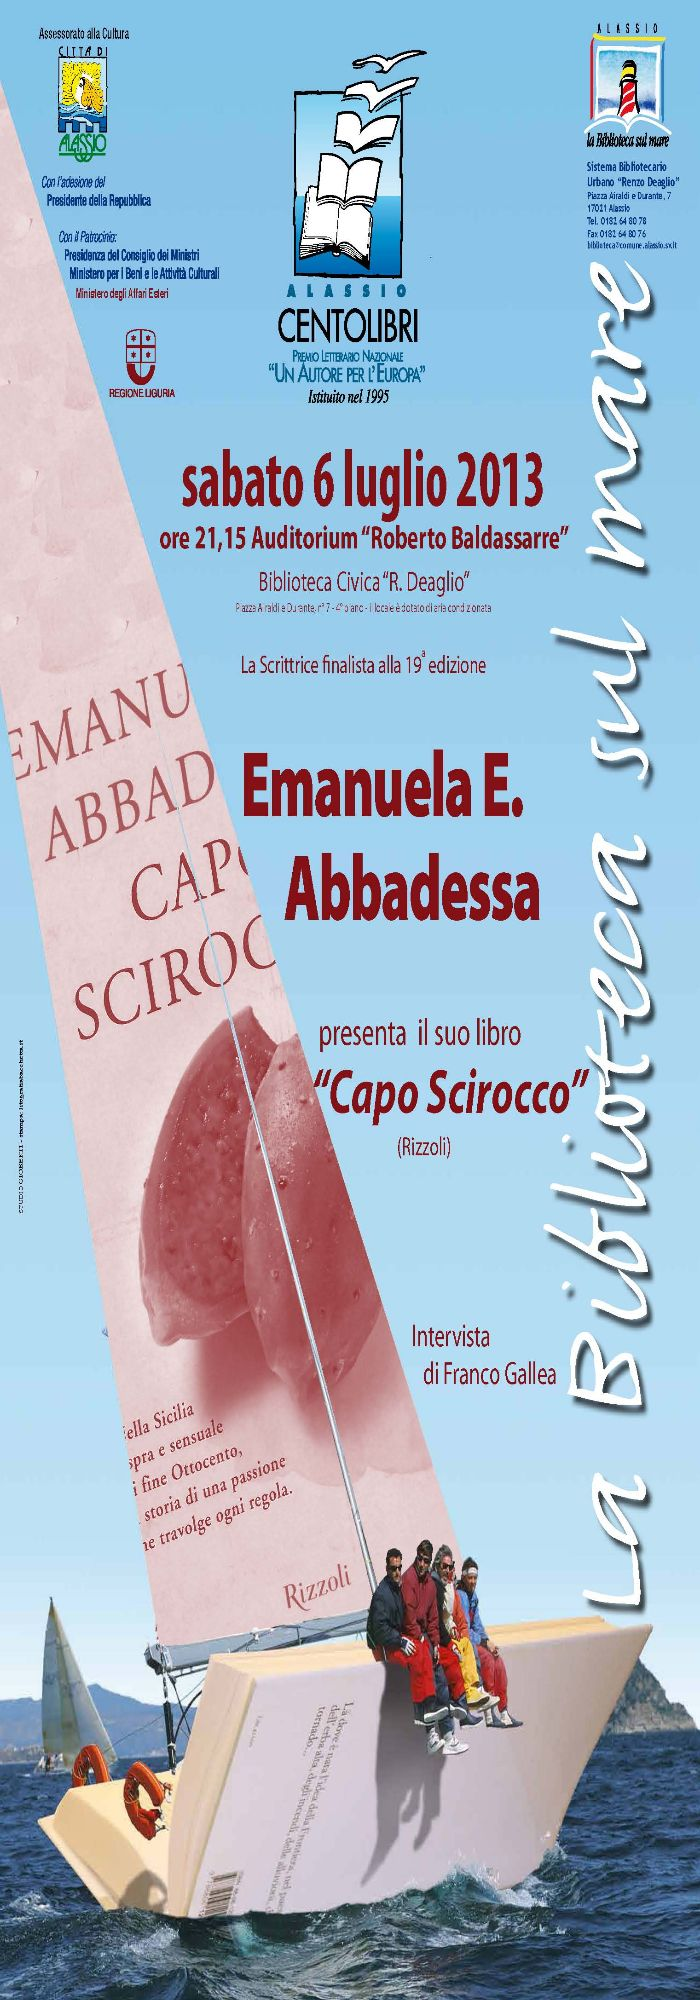 locandinabassa CENTOLIBRI ABBADESSA-STASSI_Pagina_1